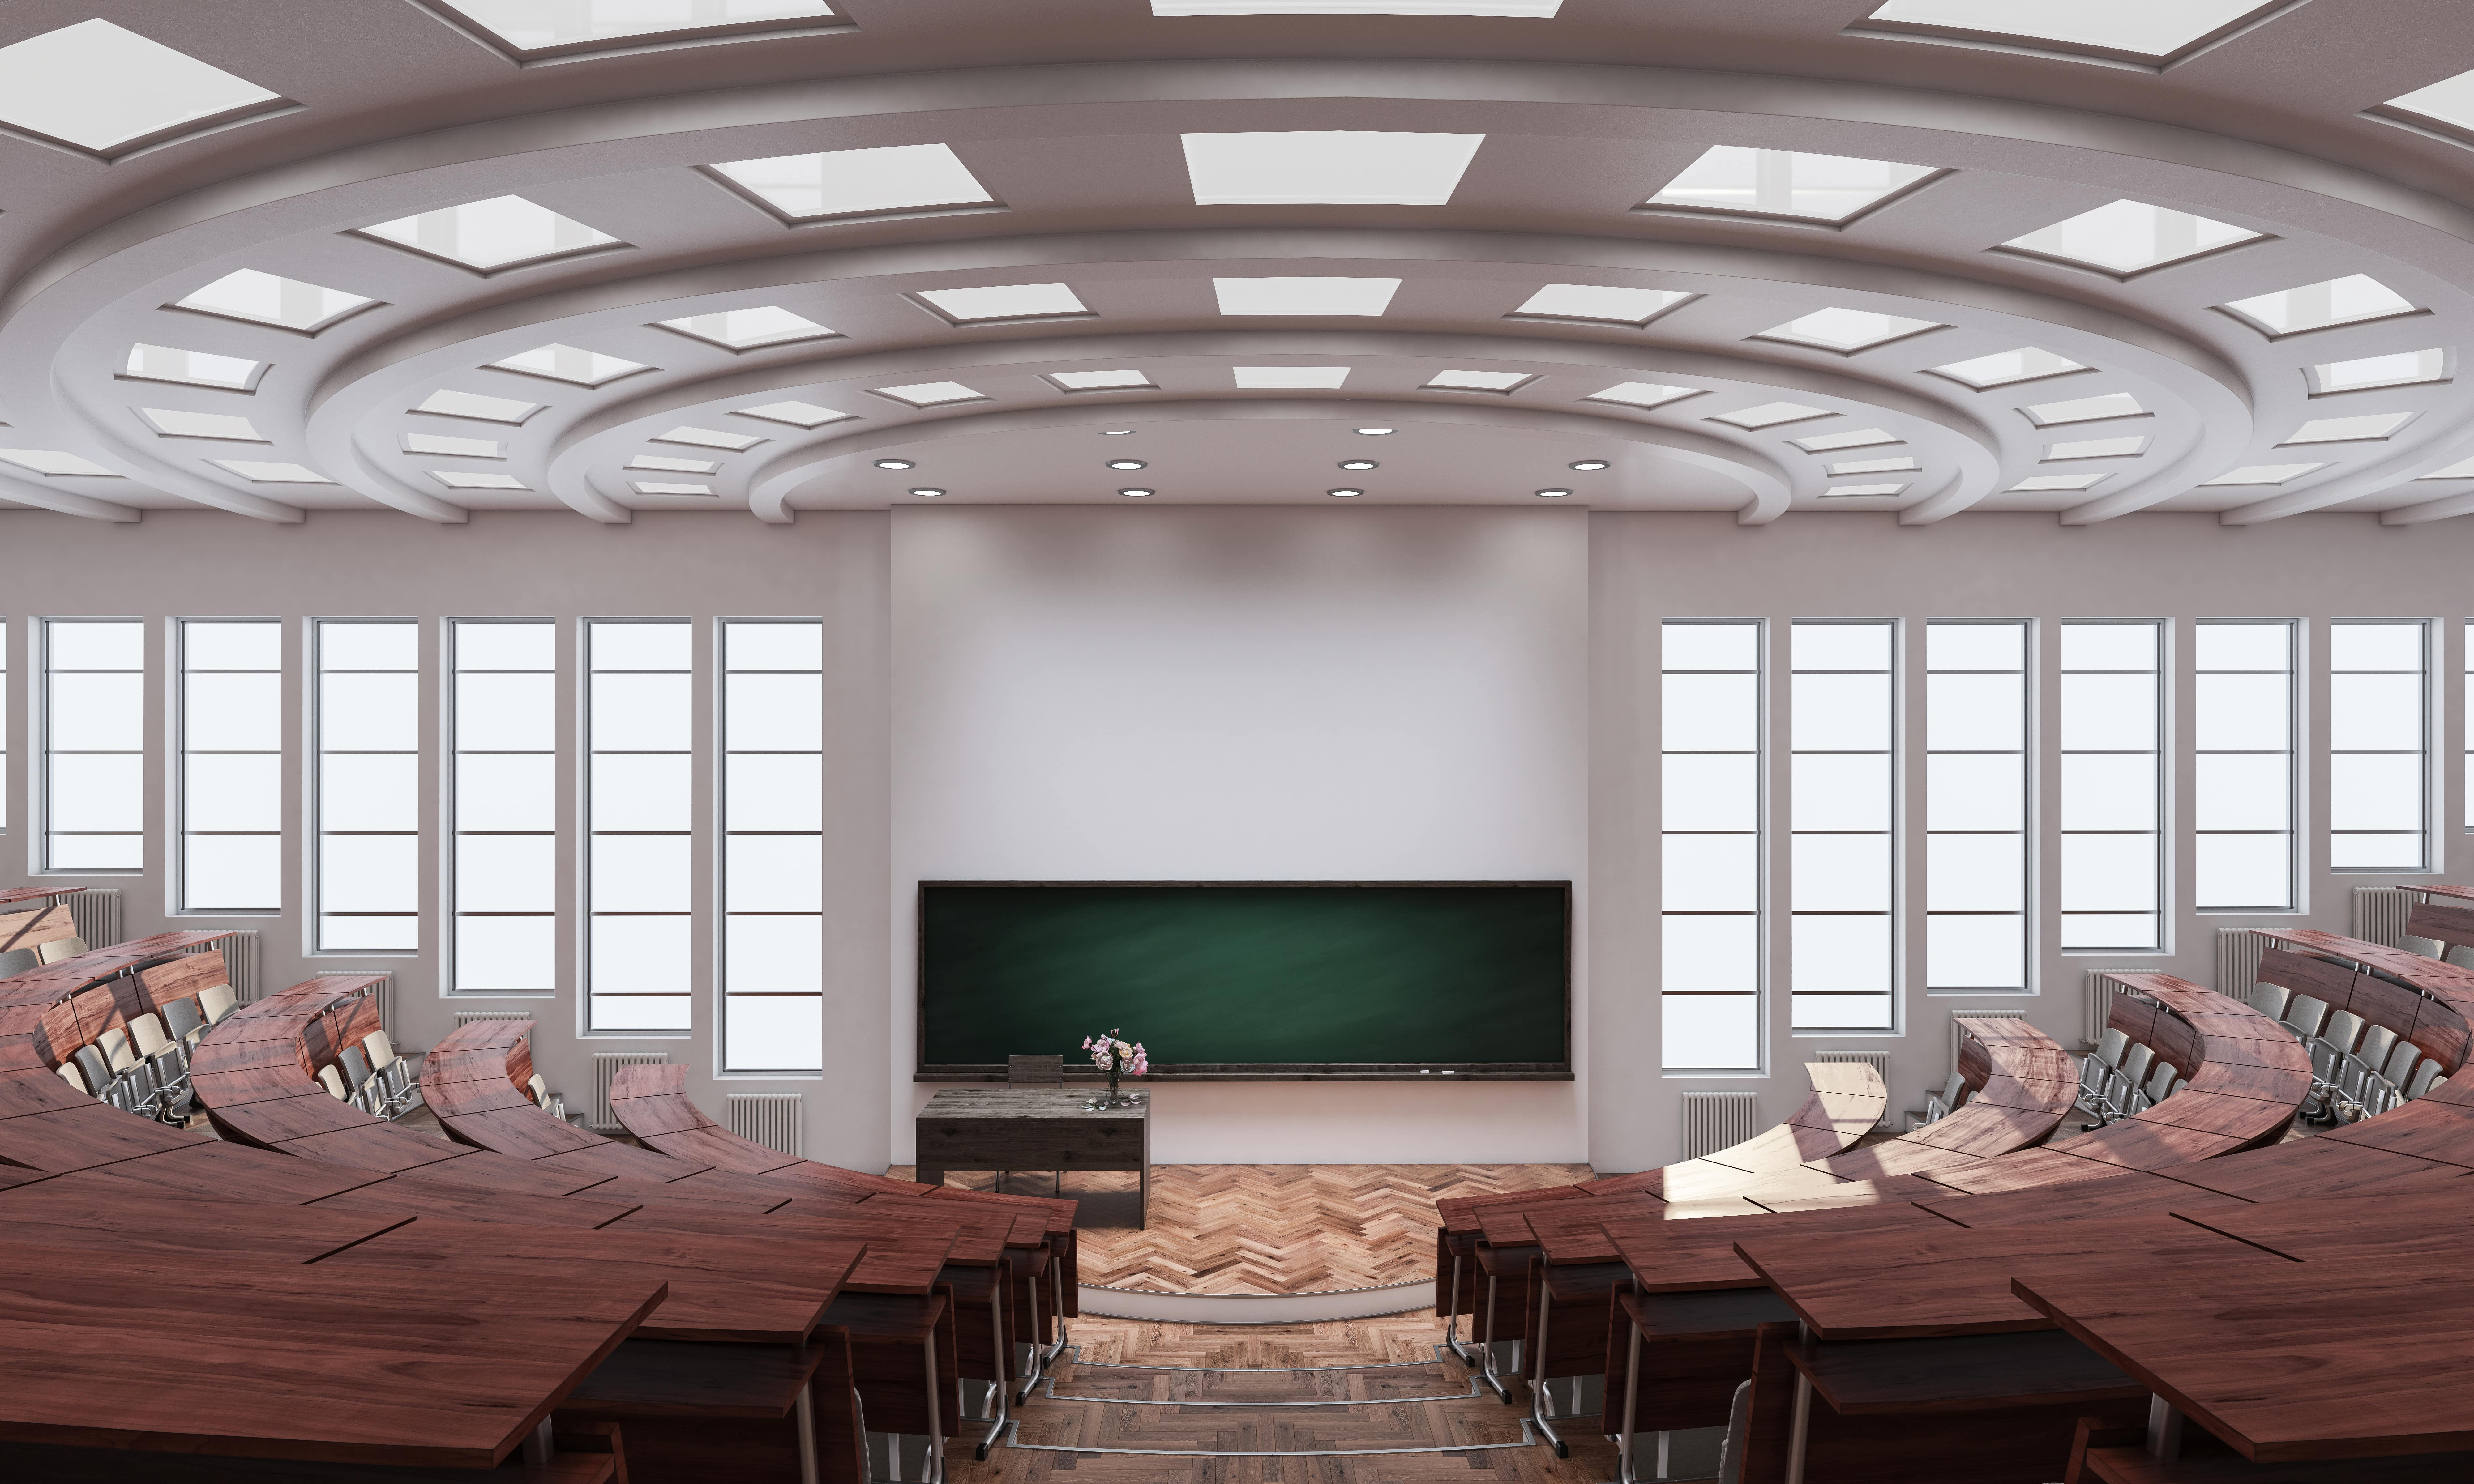 University lecture theatre.